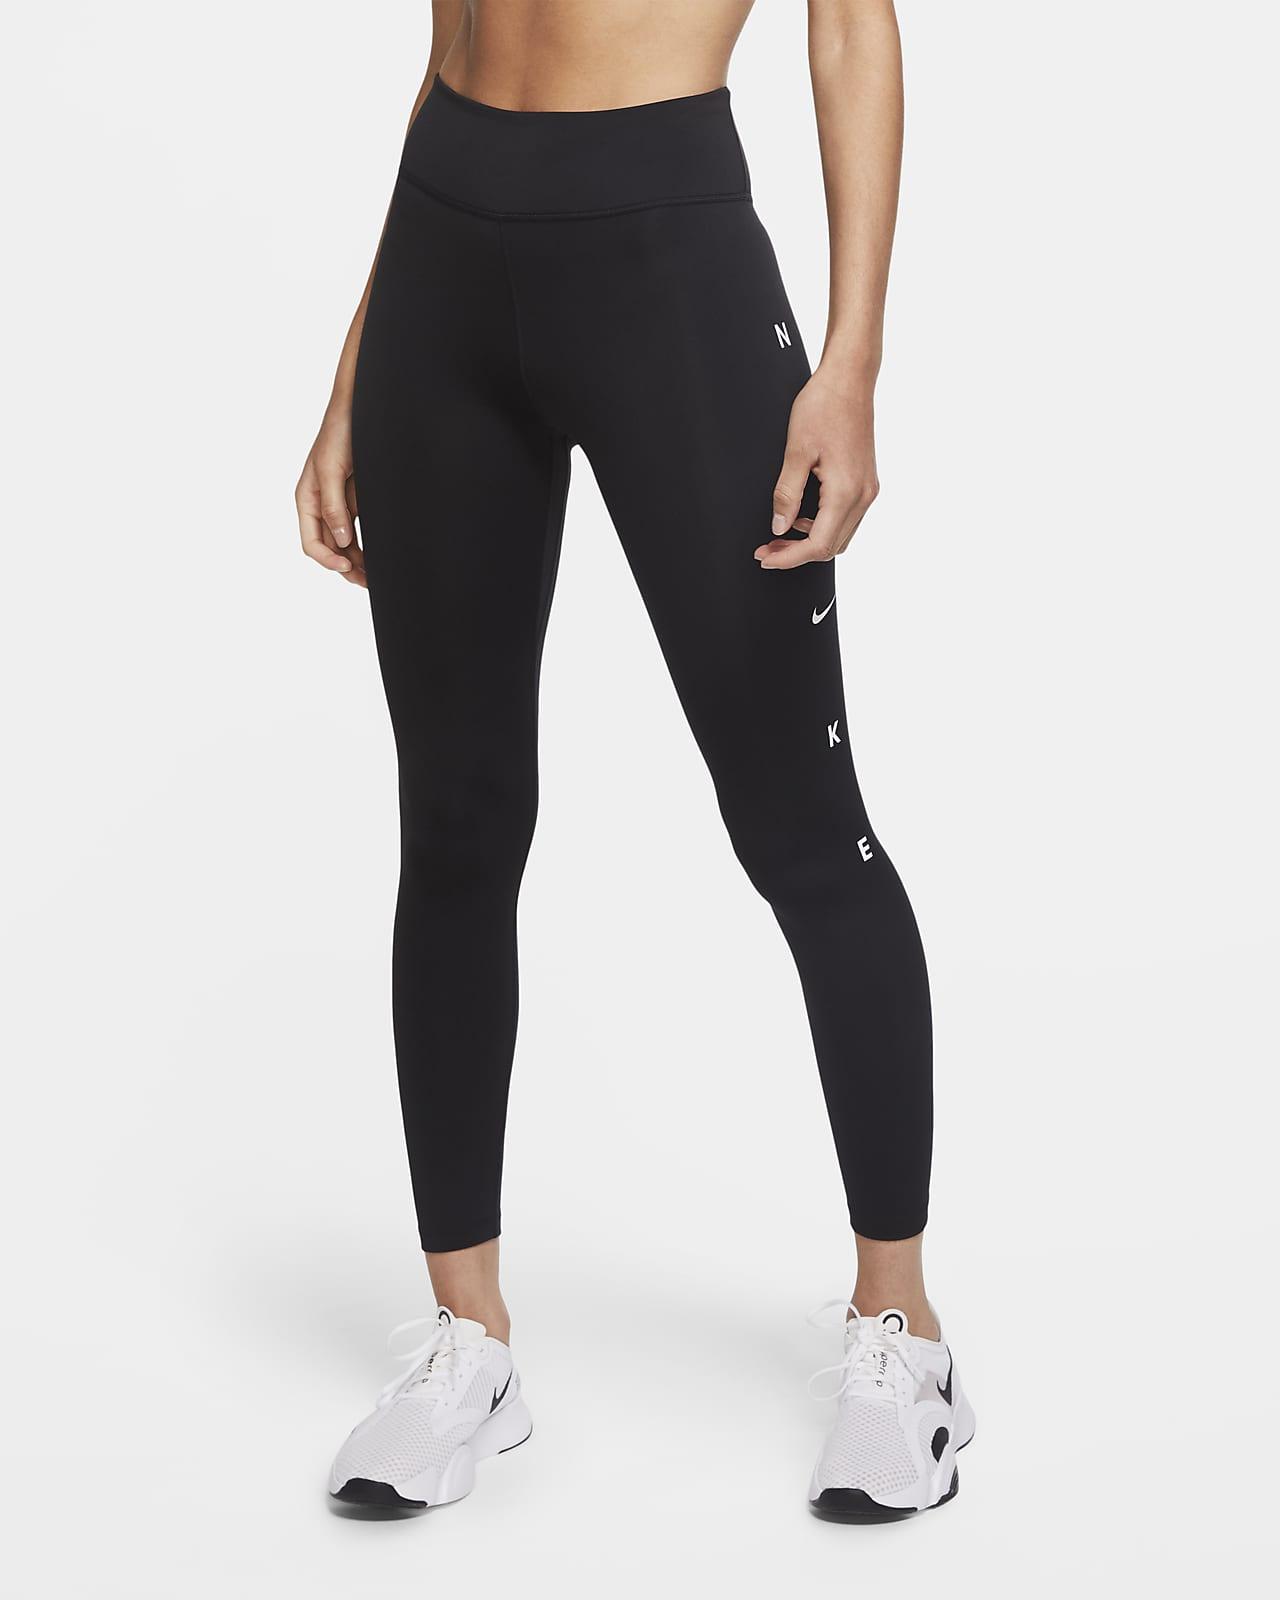 Nike One Malles de 7/8 estampades - Dona